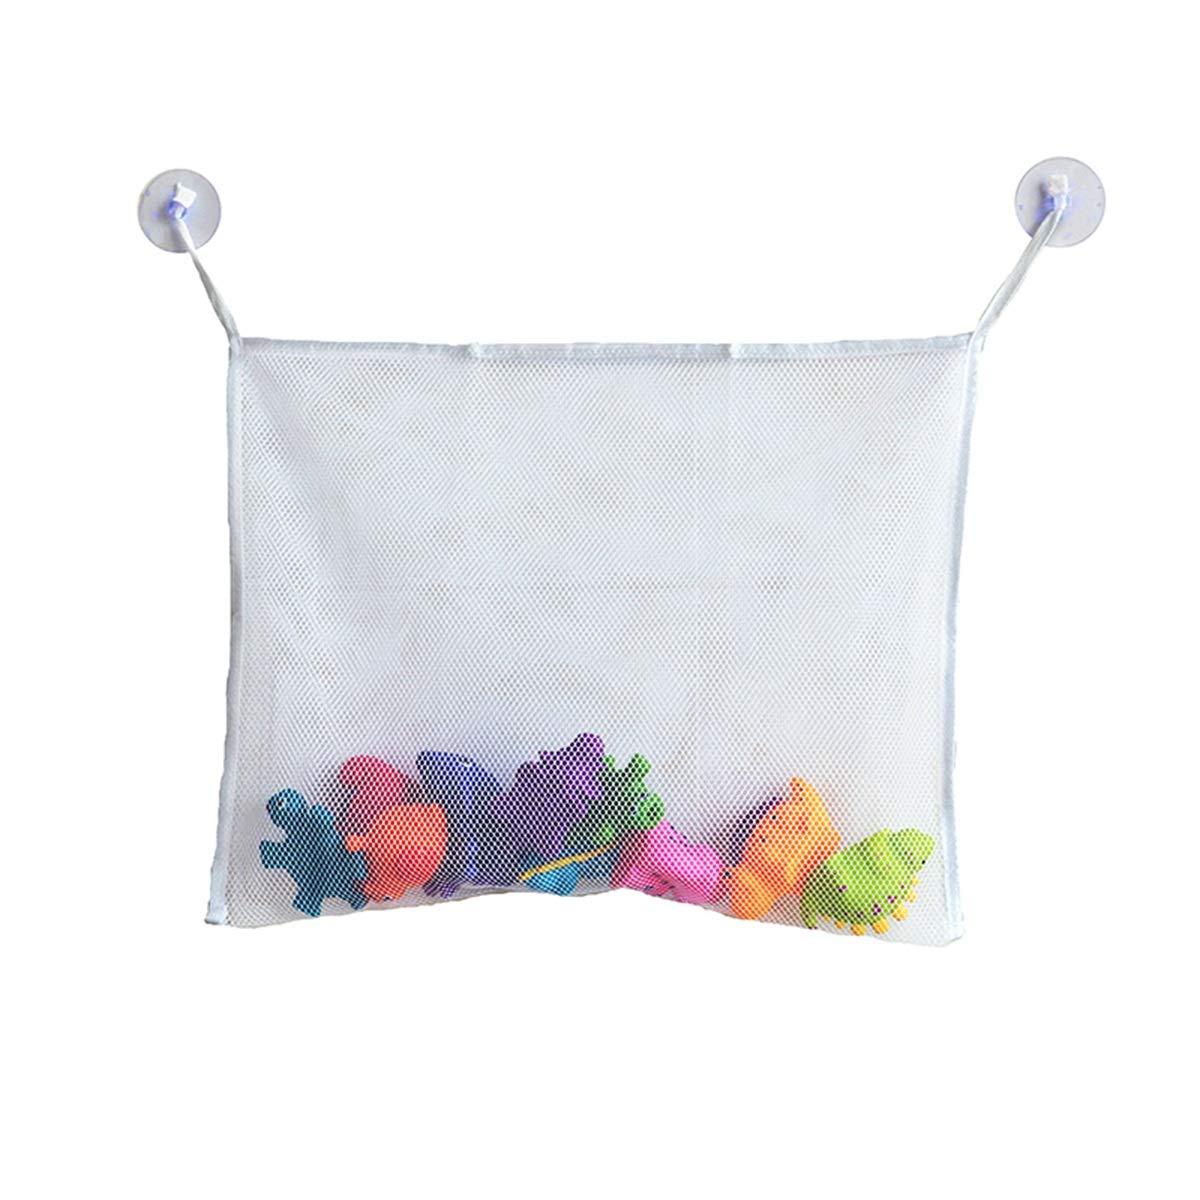 PeiXuan2019 Toy Organizer Net Suction Sucker Mount Toy Storage Hanging Mesh Bag for Baby Bath Bathroom Shower